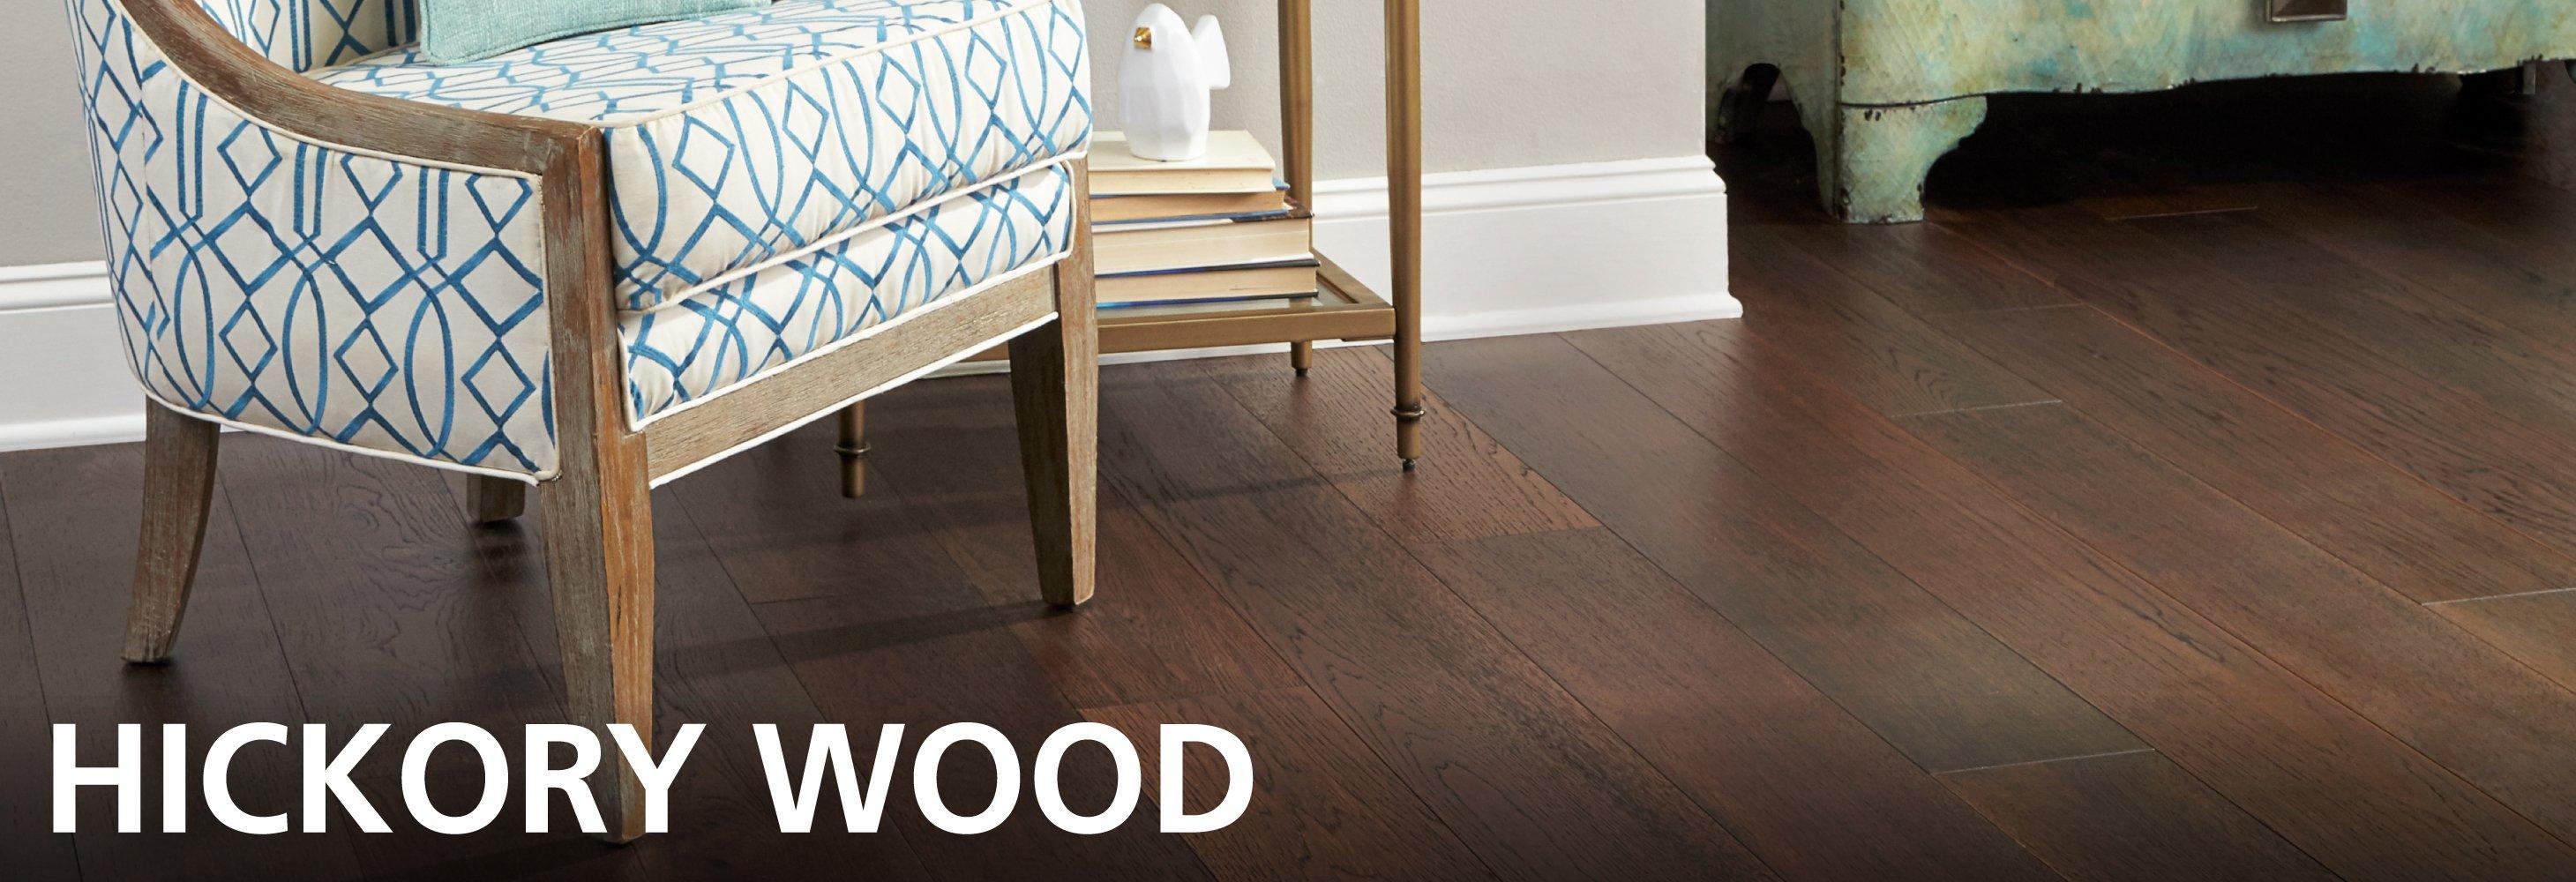 Hickory Wood Flooring Floor Decor